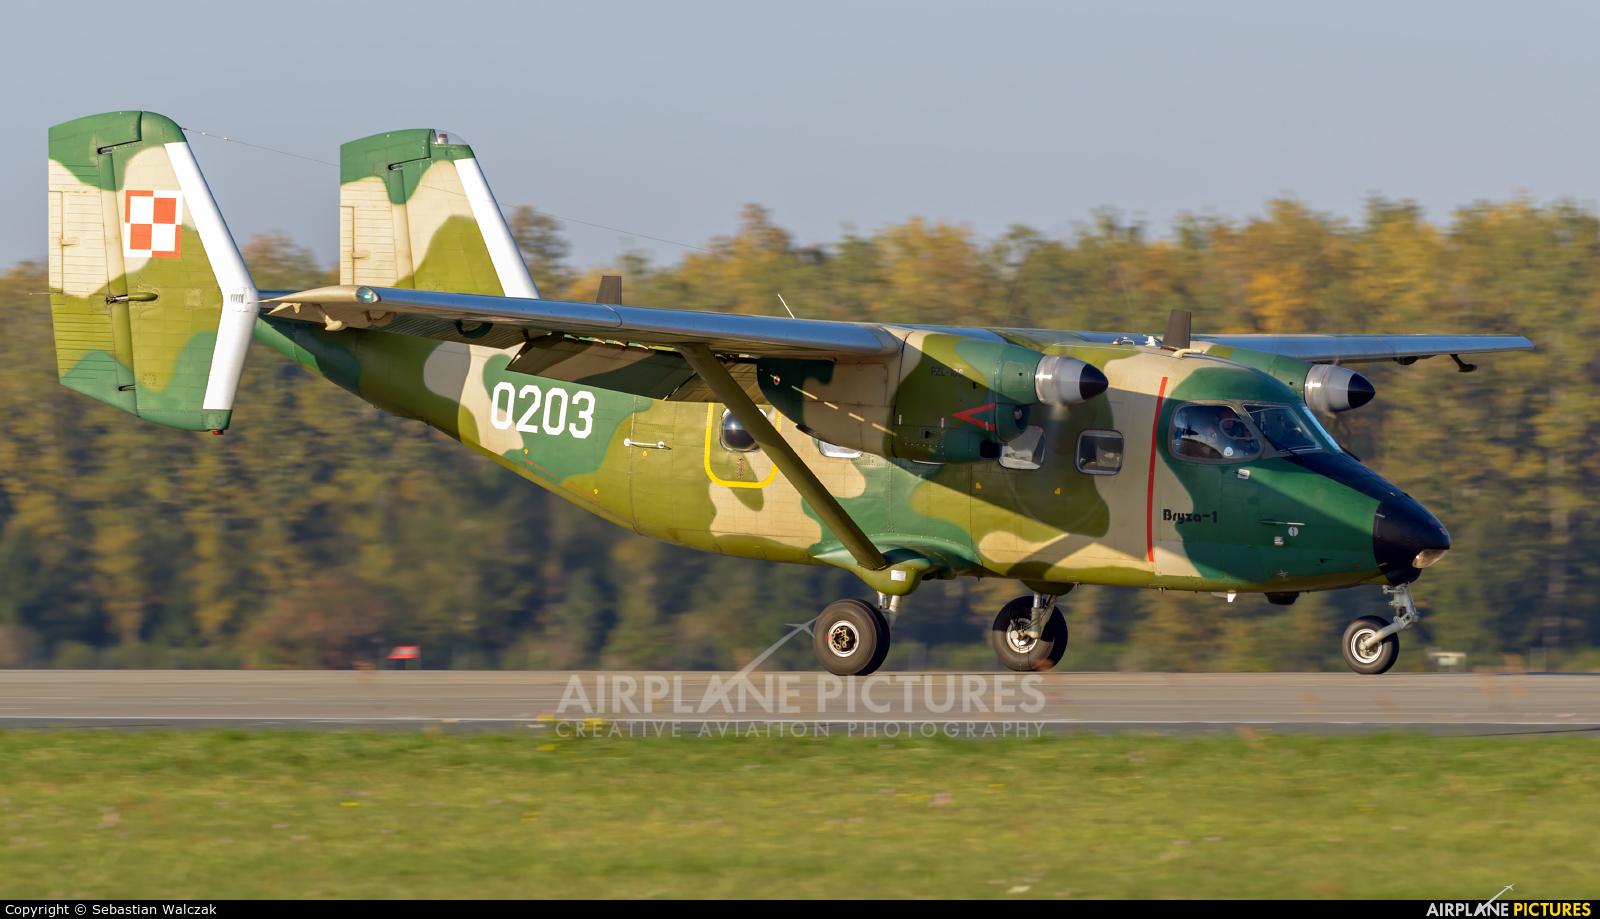 Poland - Army 0203 aircraft at Poznań - Krzesiny